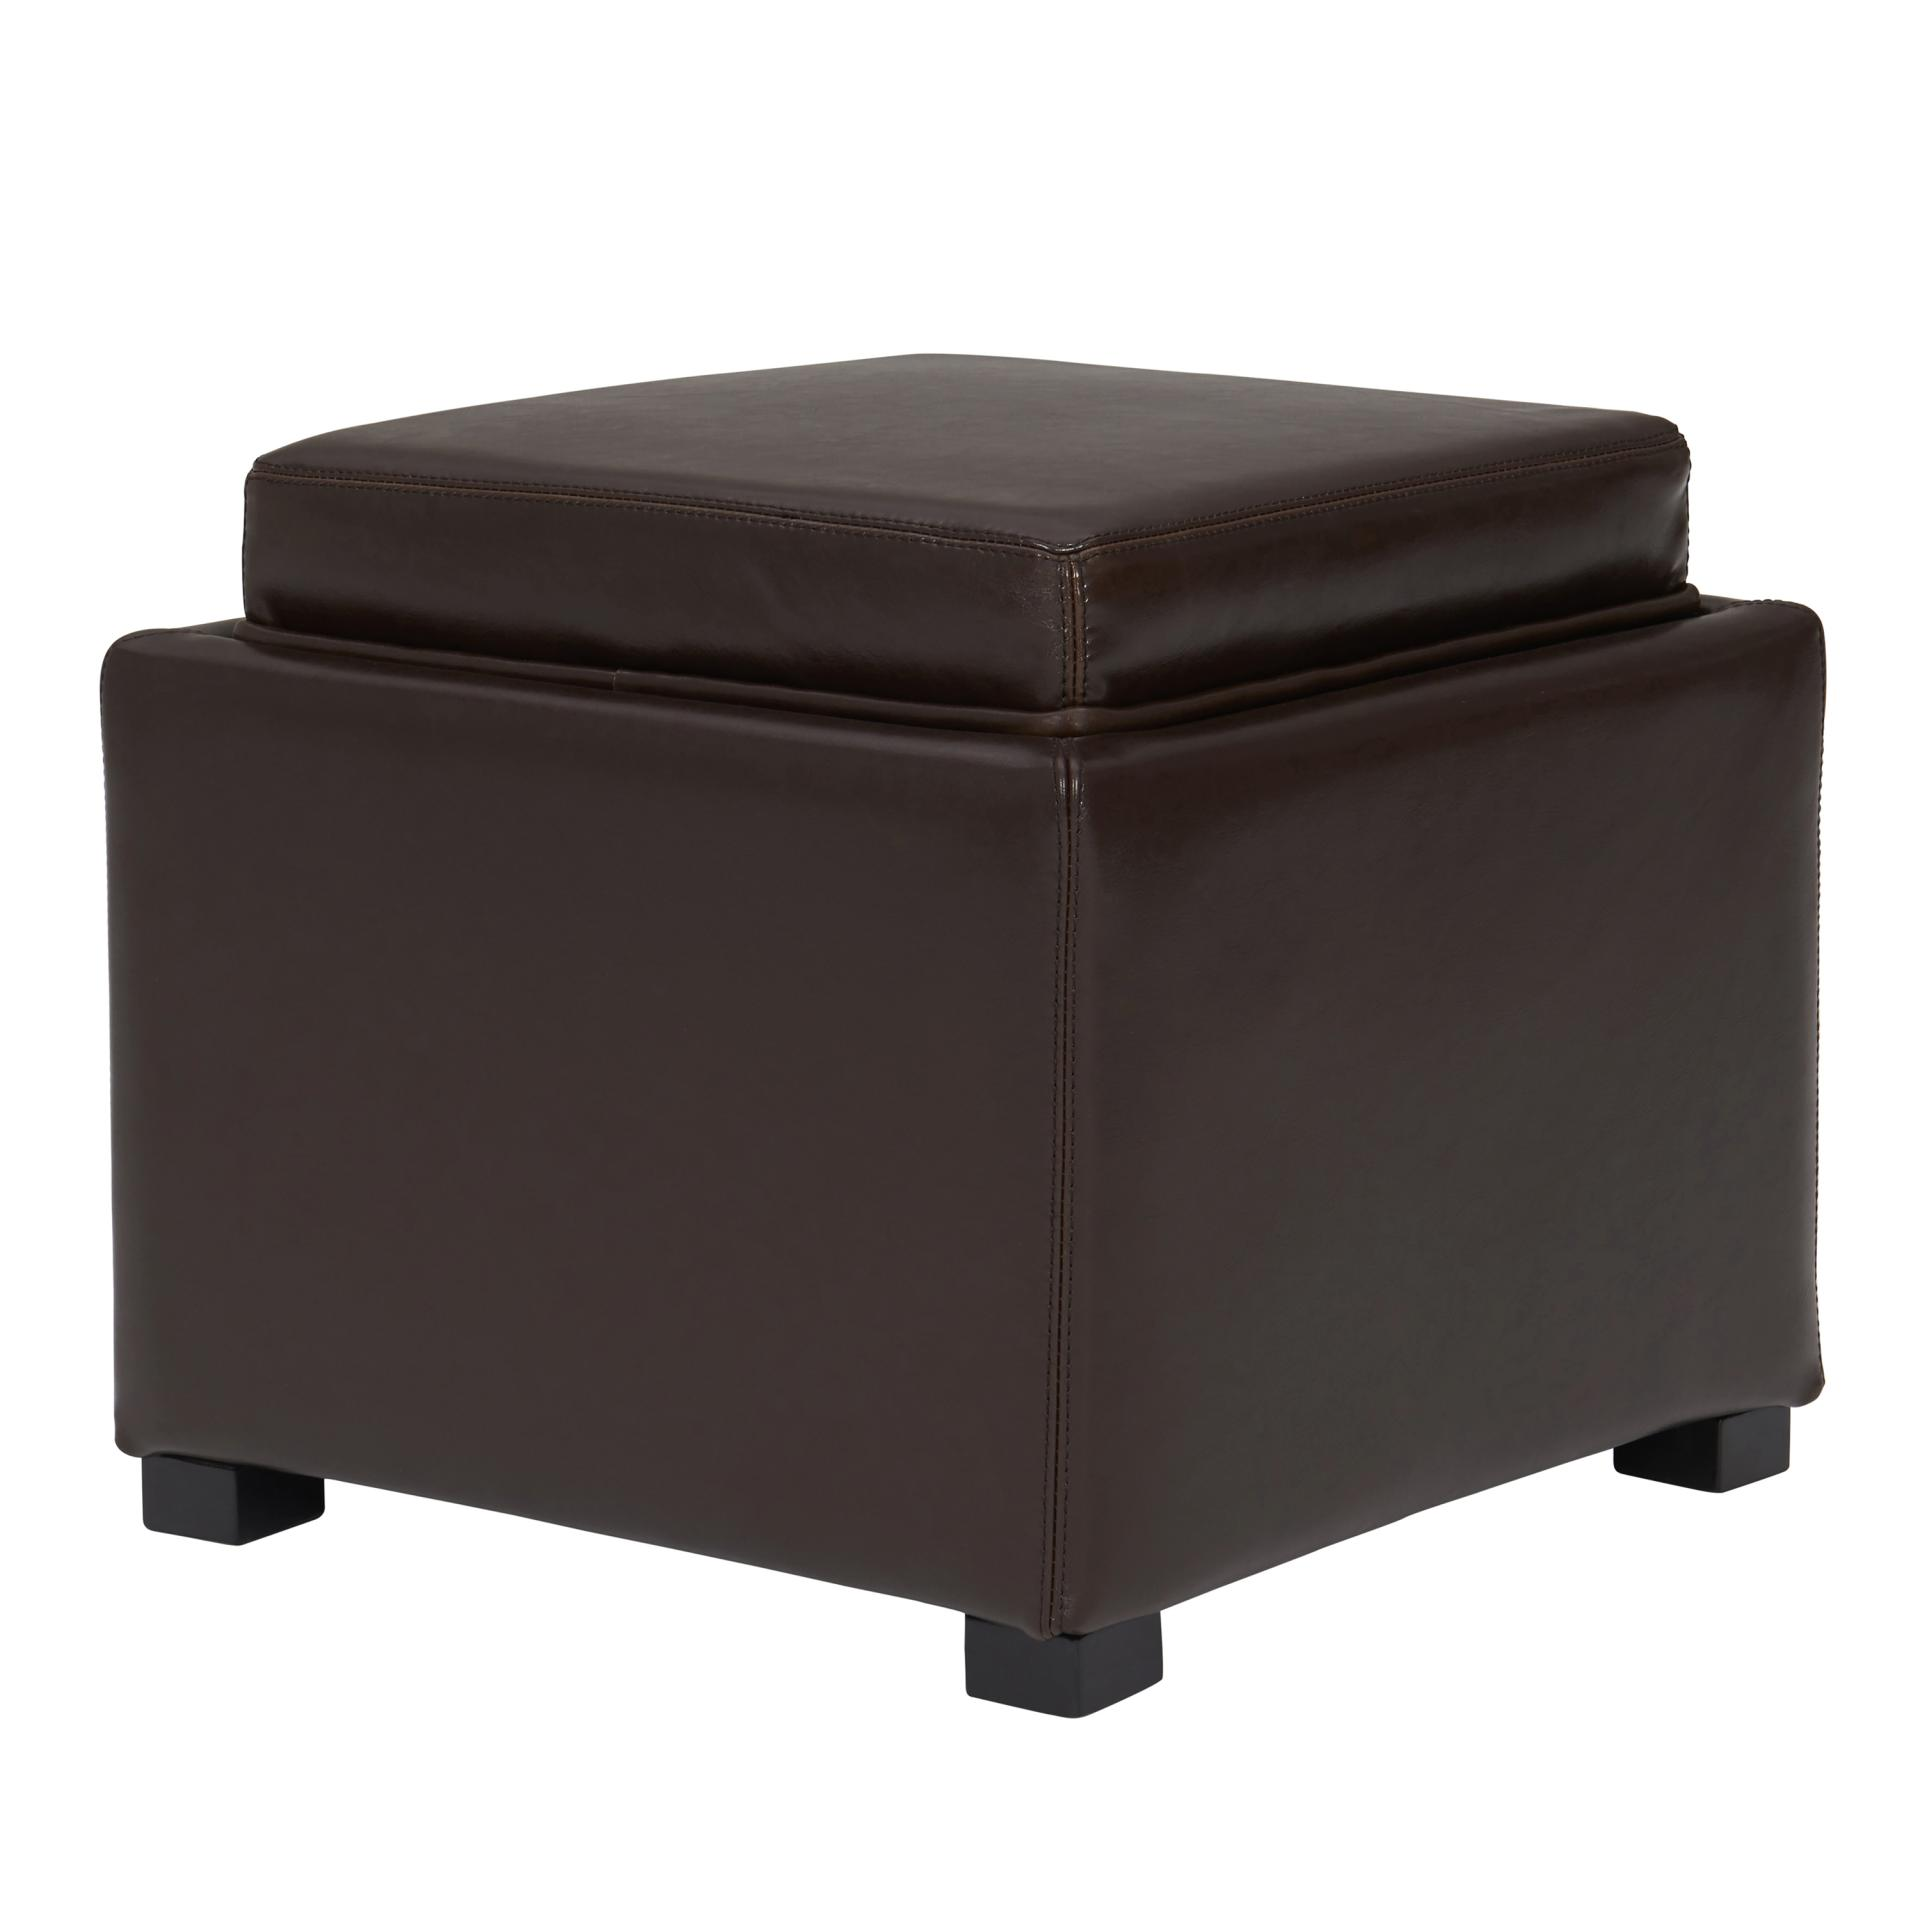 113042 01 Npd Home Furniture Wholesale Lifestyle